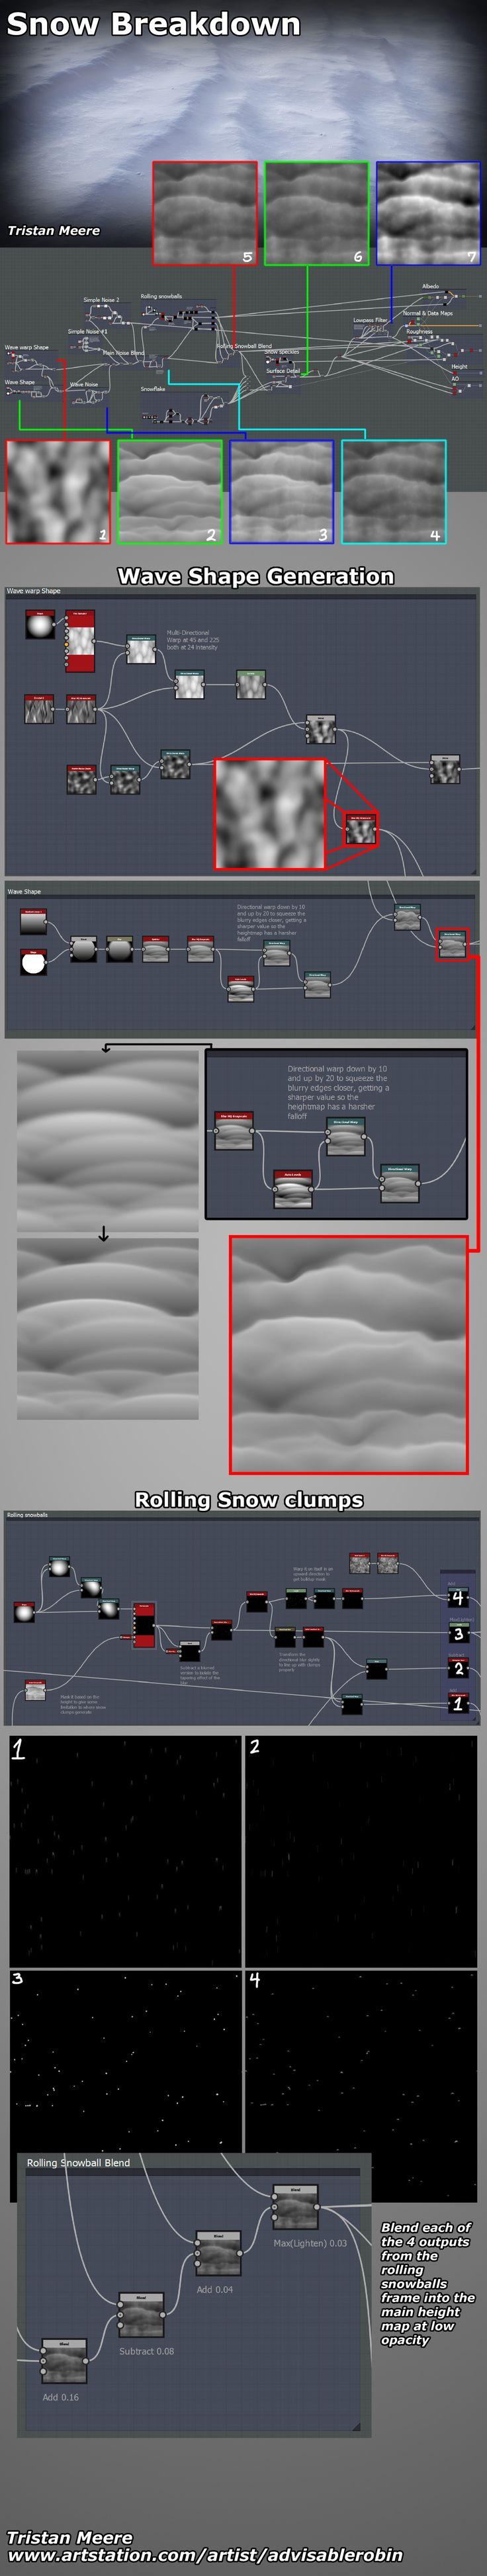 ArtStation - Windswept Snow Breakdown & Tips - Substance Designer 5, Tristan Meere